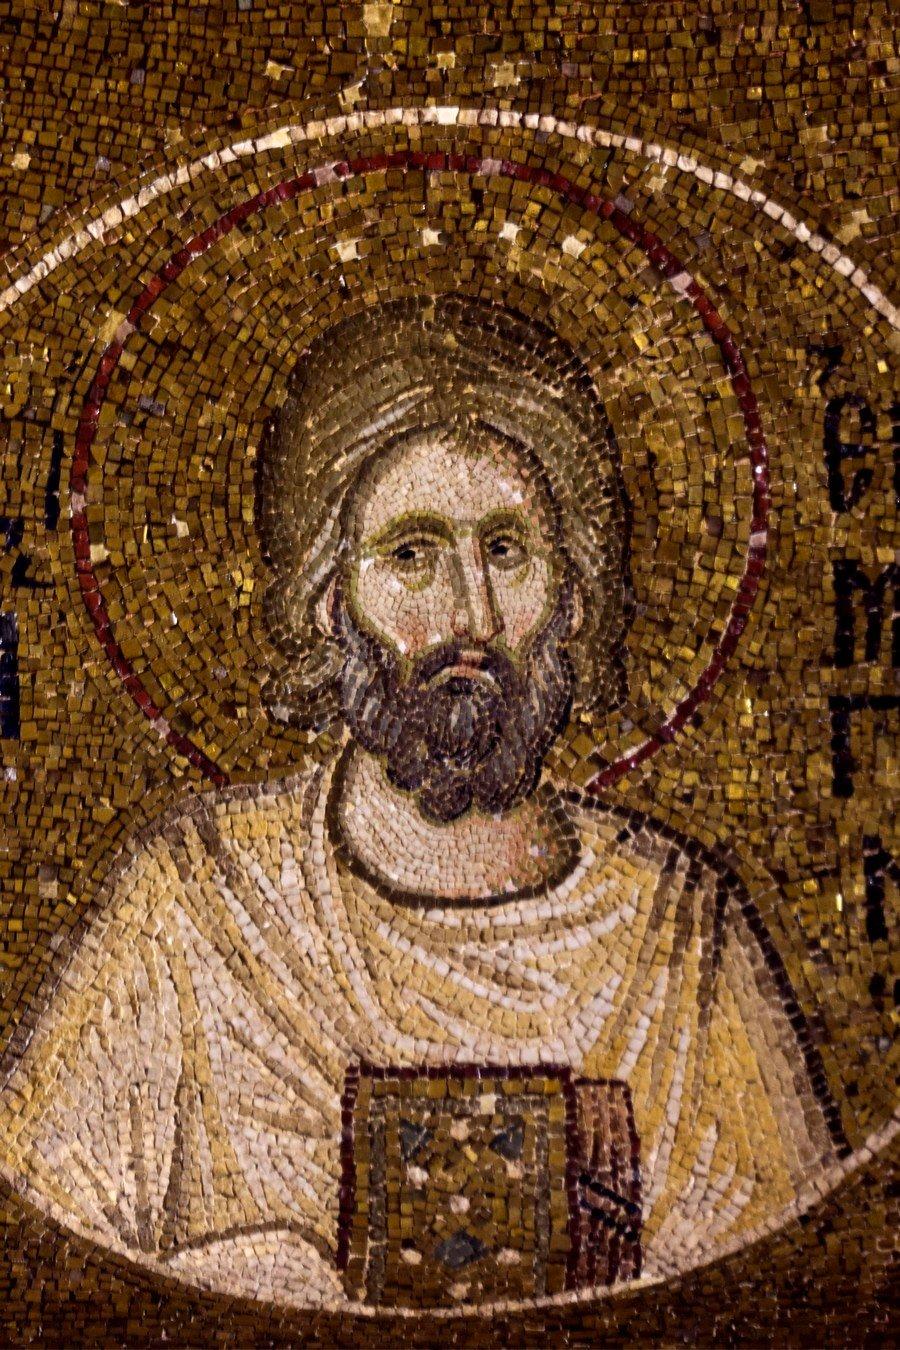 Святой Мученик Ермоген Александрийский. Мозаика монастыря Хора в Константинополе. 1315 - 1321 годы.